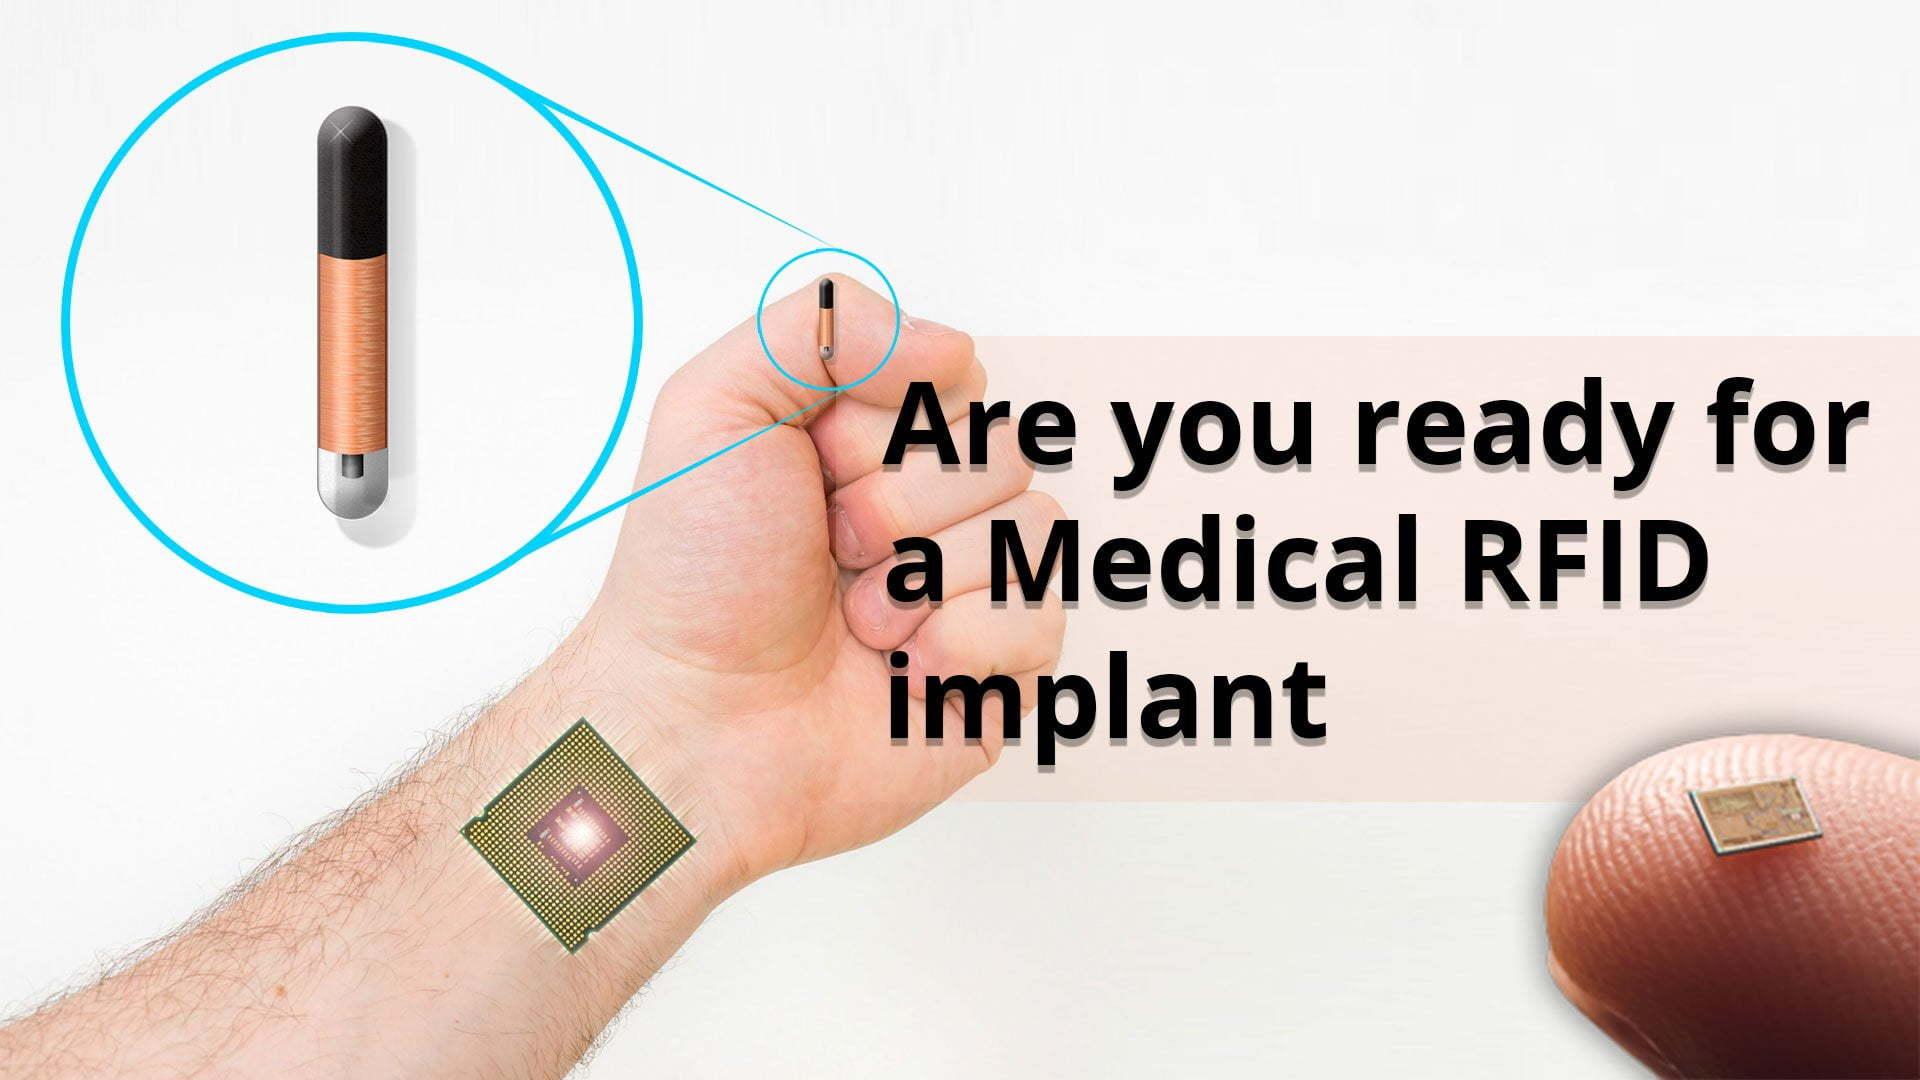 Human Microchip Implant - Medical RFID